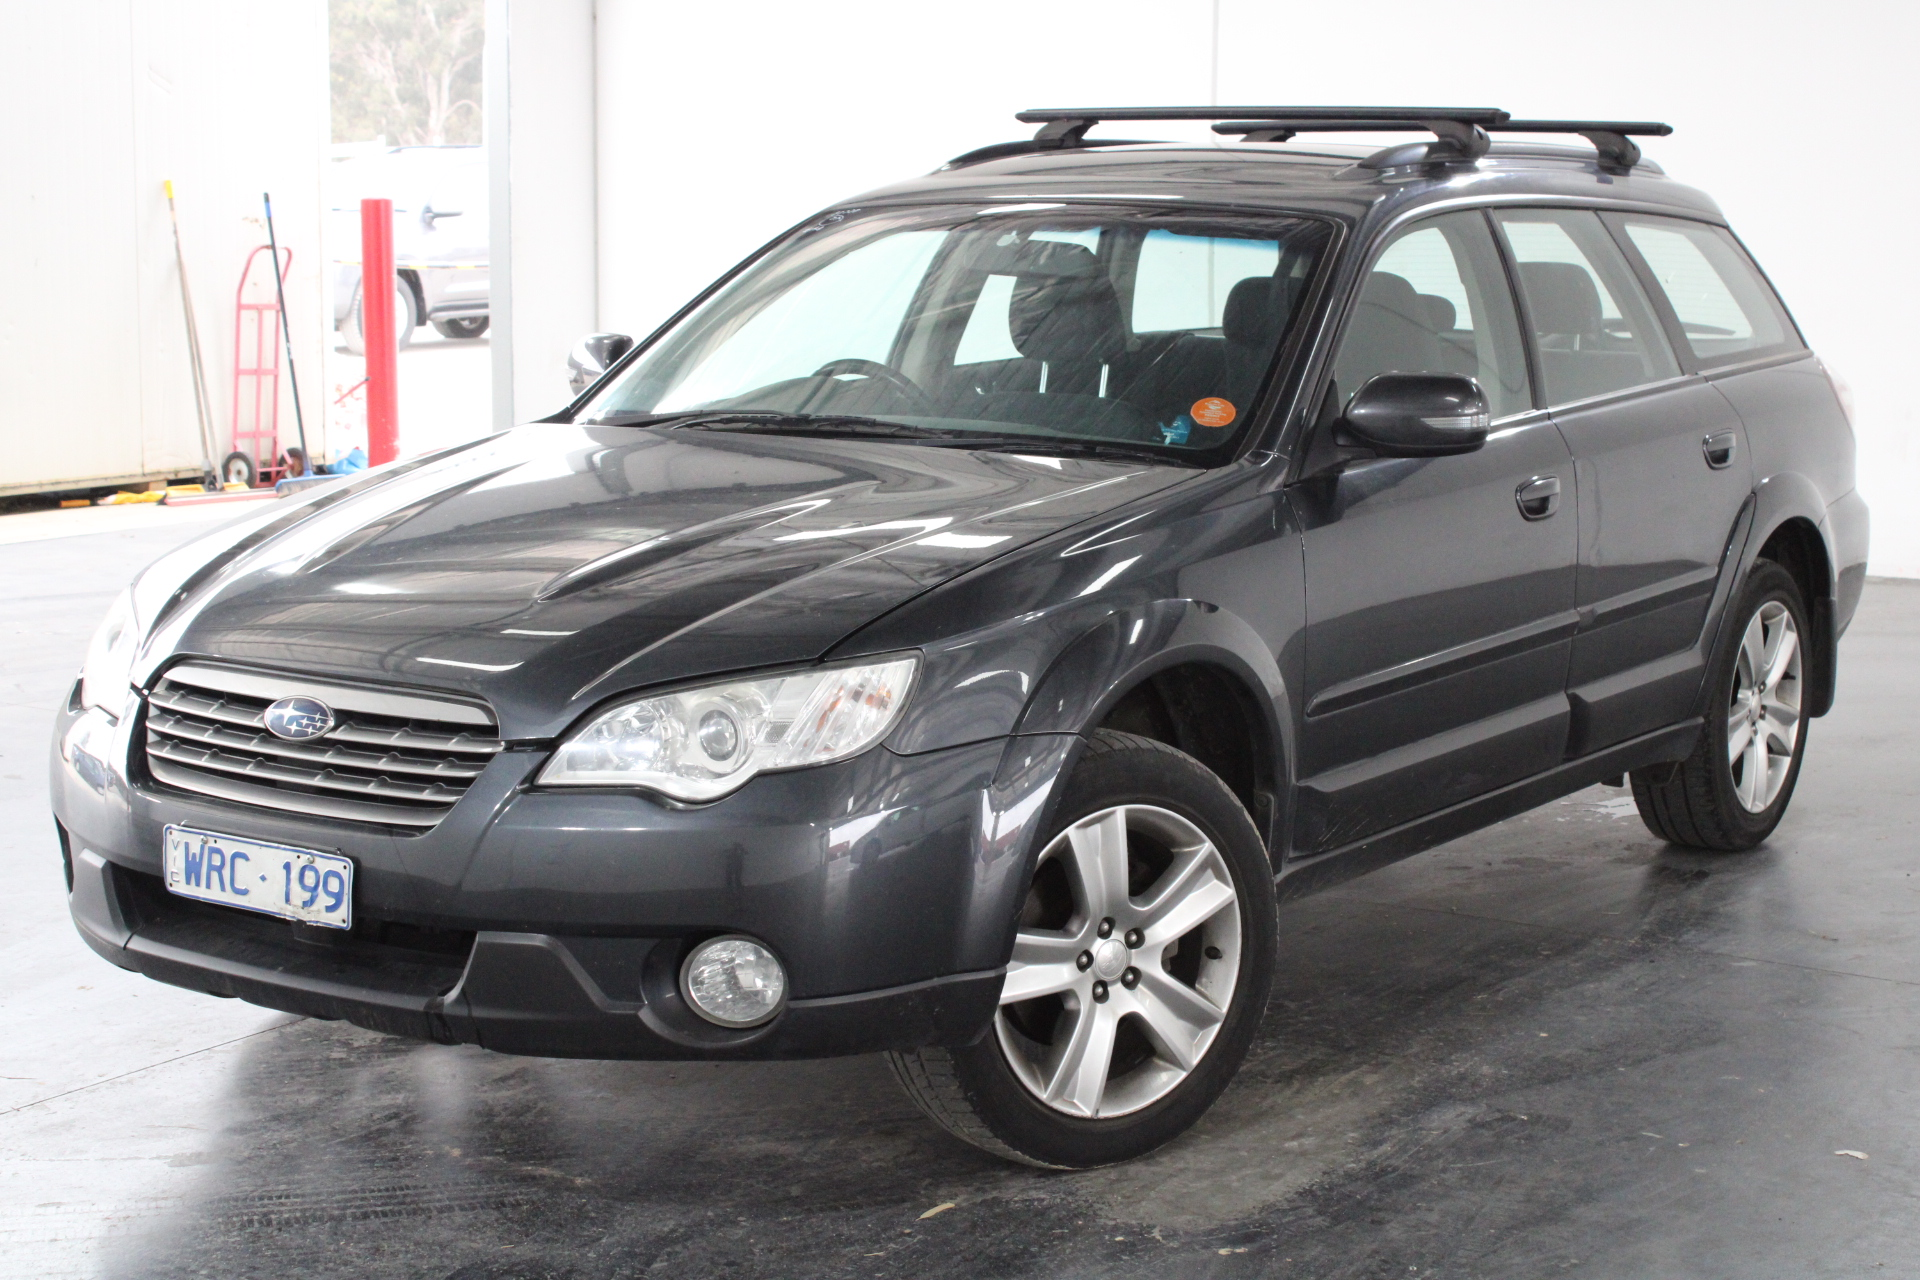 2008 Subaru Outback 2.5i B4A Automatic Wagon